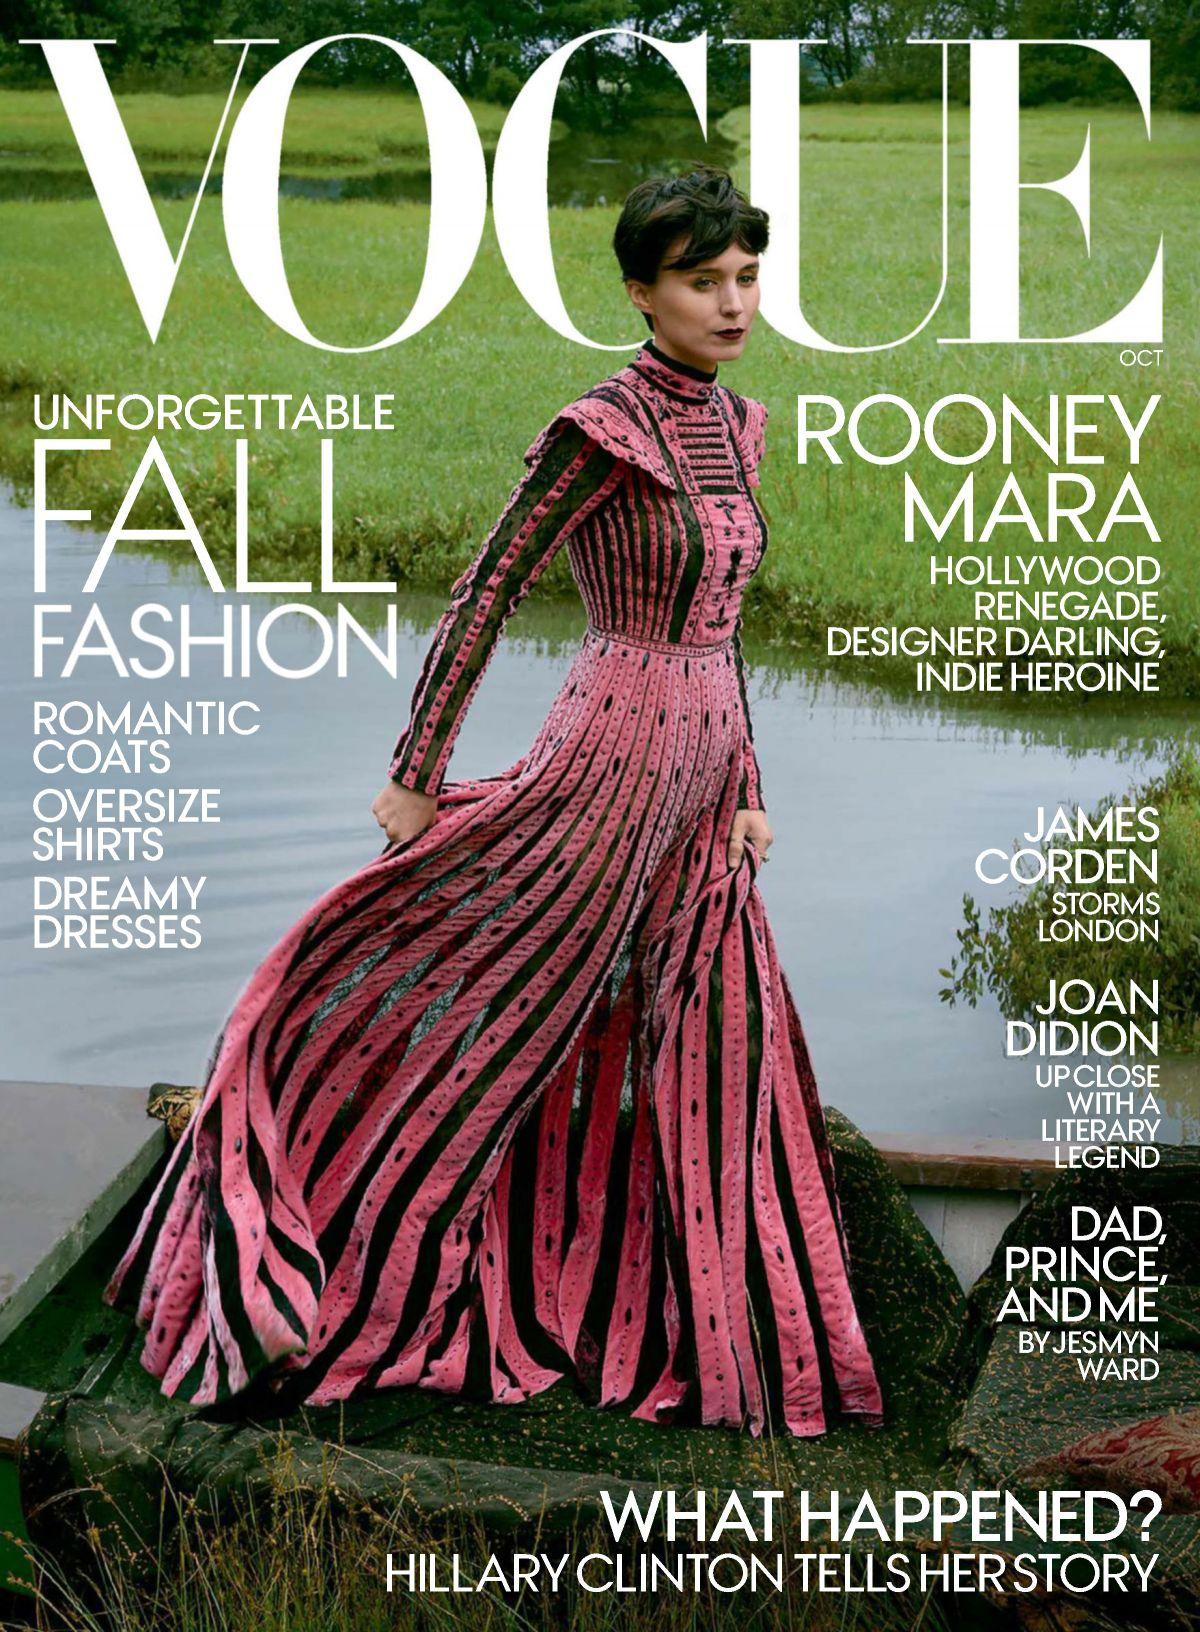 ROONEY MARA for Vogue Magazine, October 2017